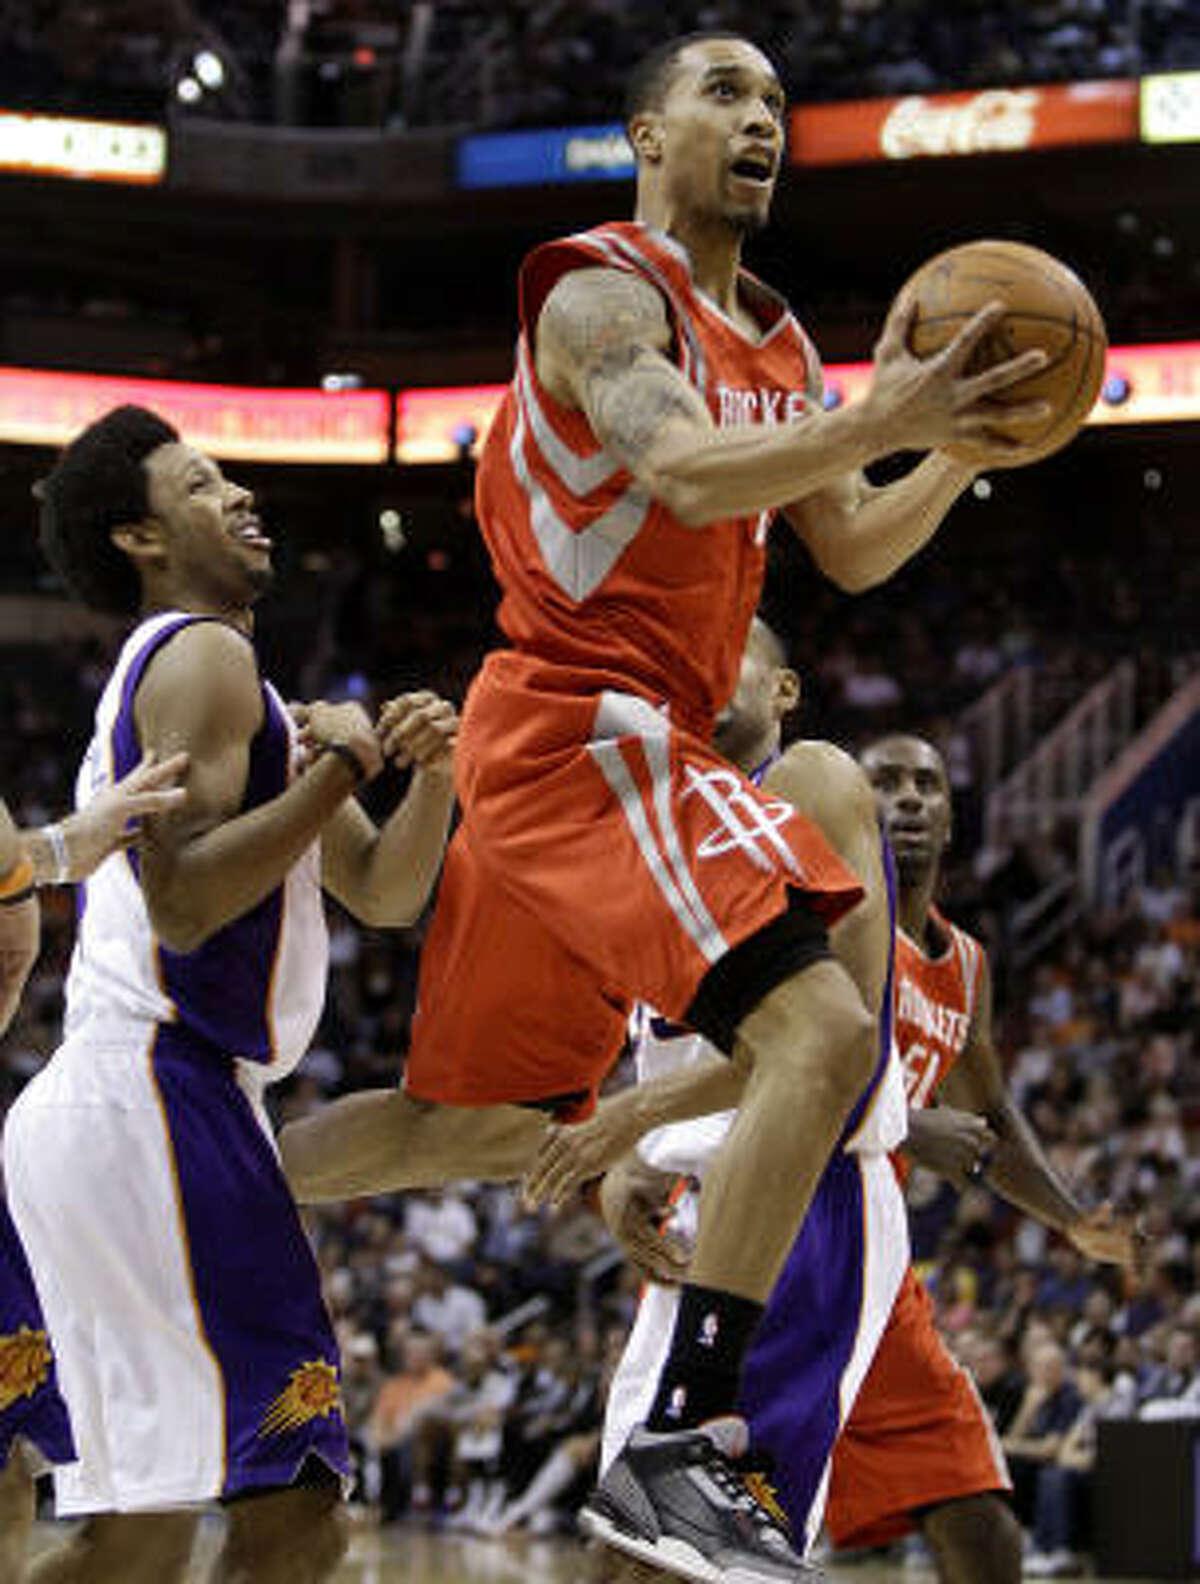 Rockets guard Courtney Lee drives past Suns forward Josh Childress, left.